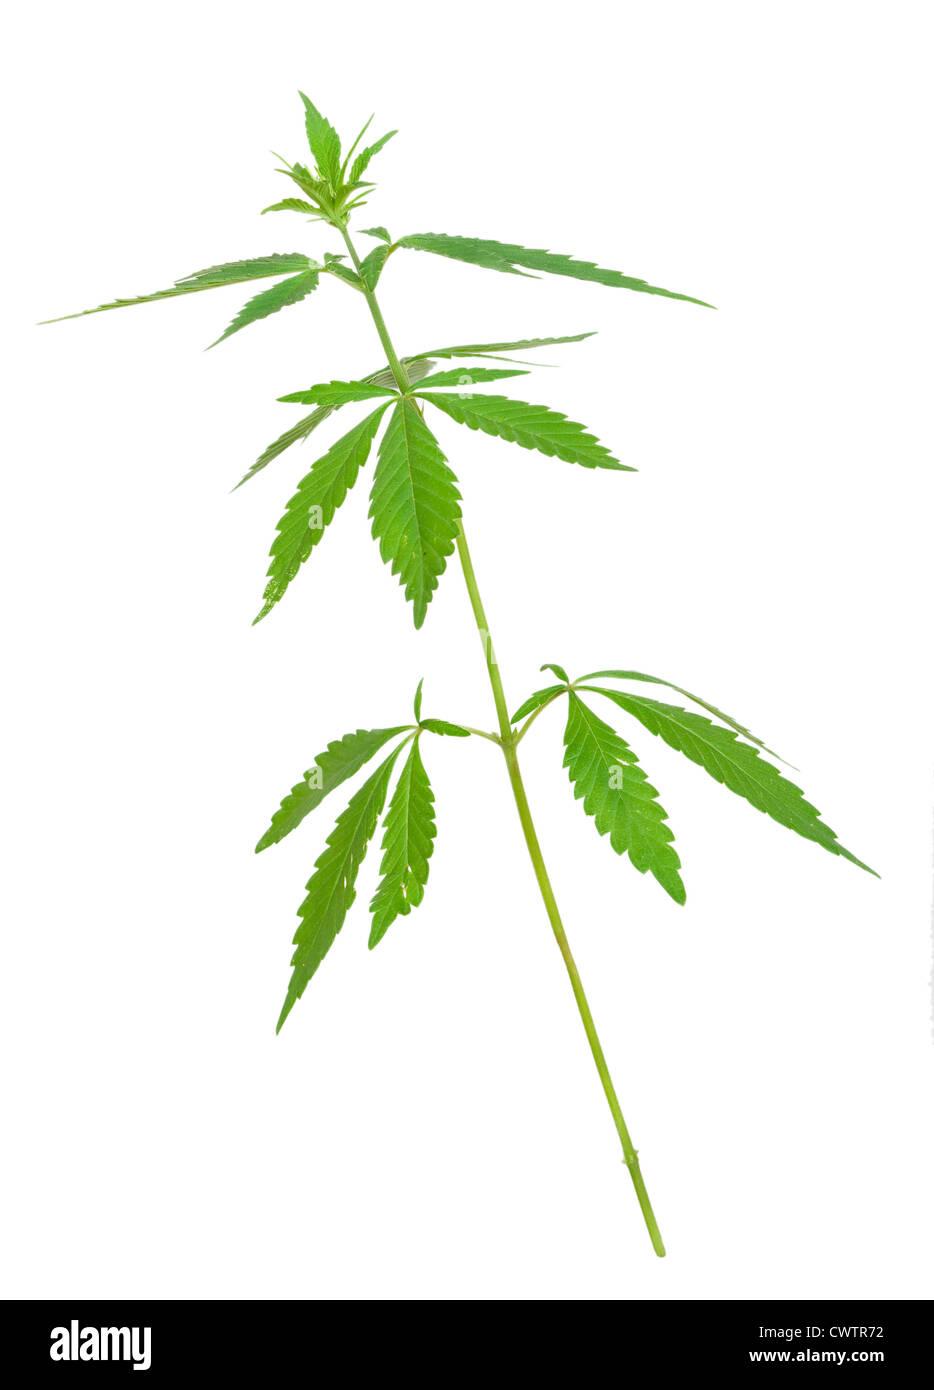 Cannabis plant - Stock Image